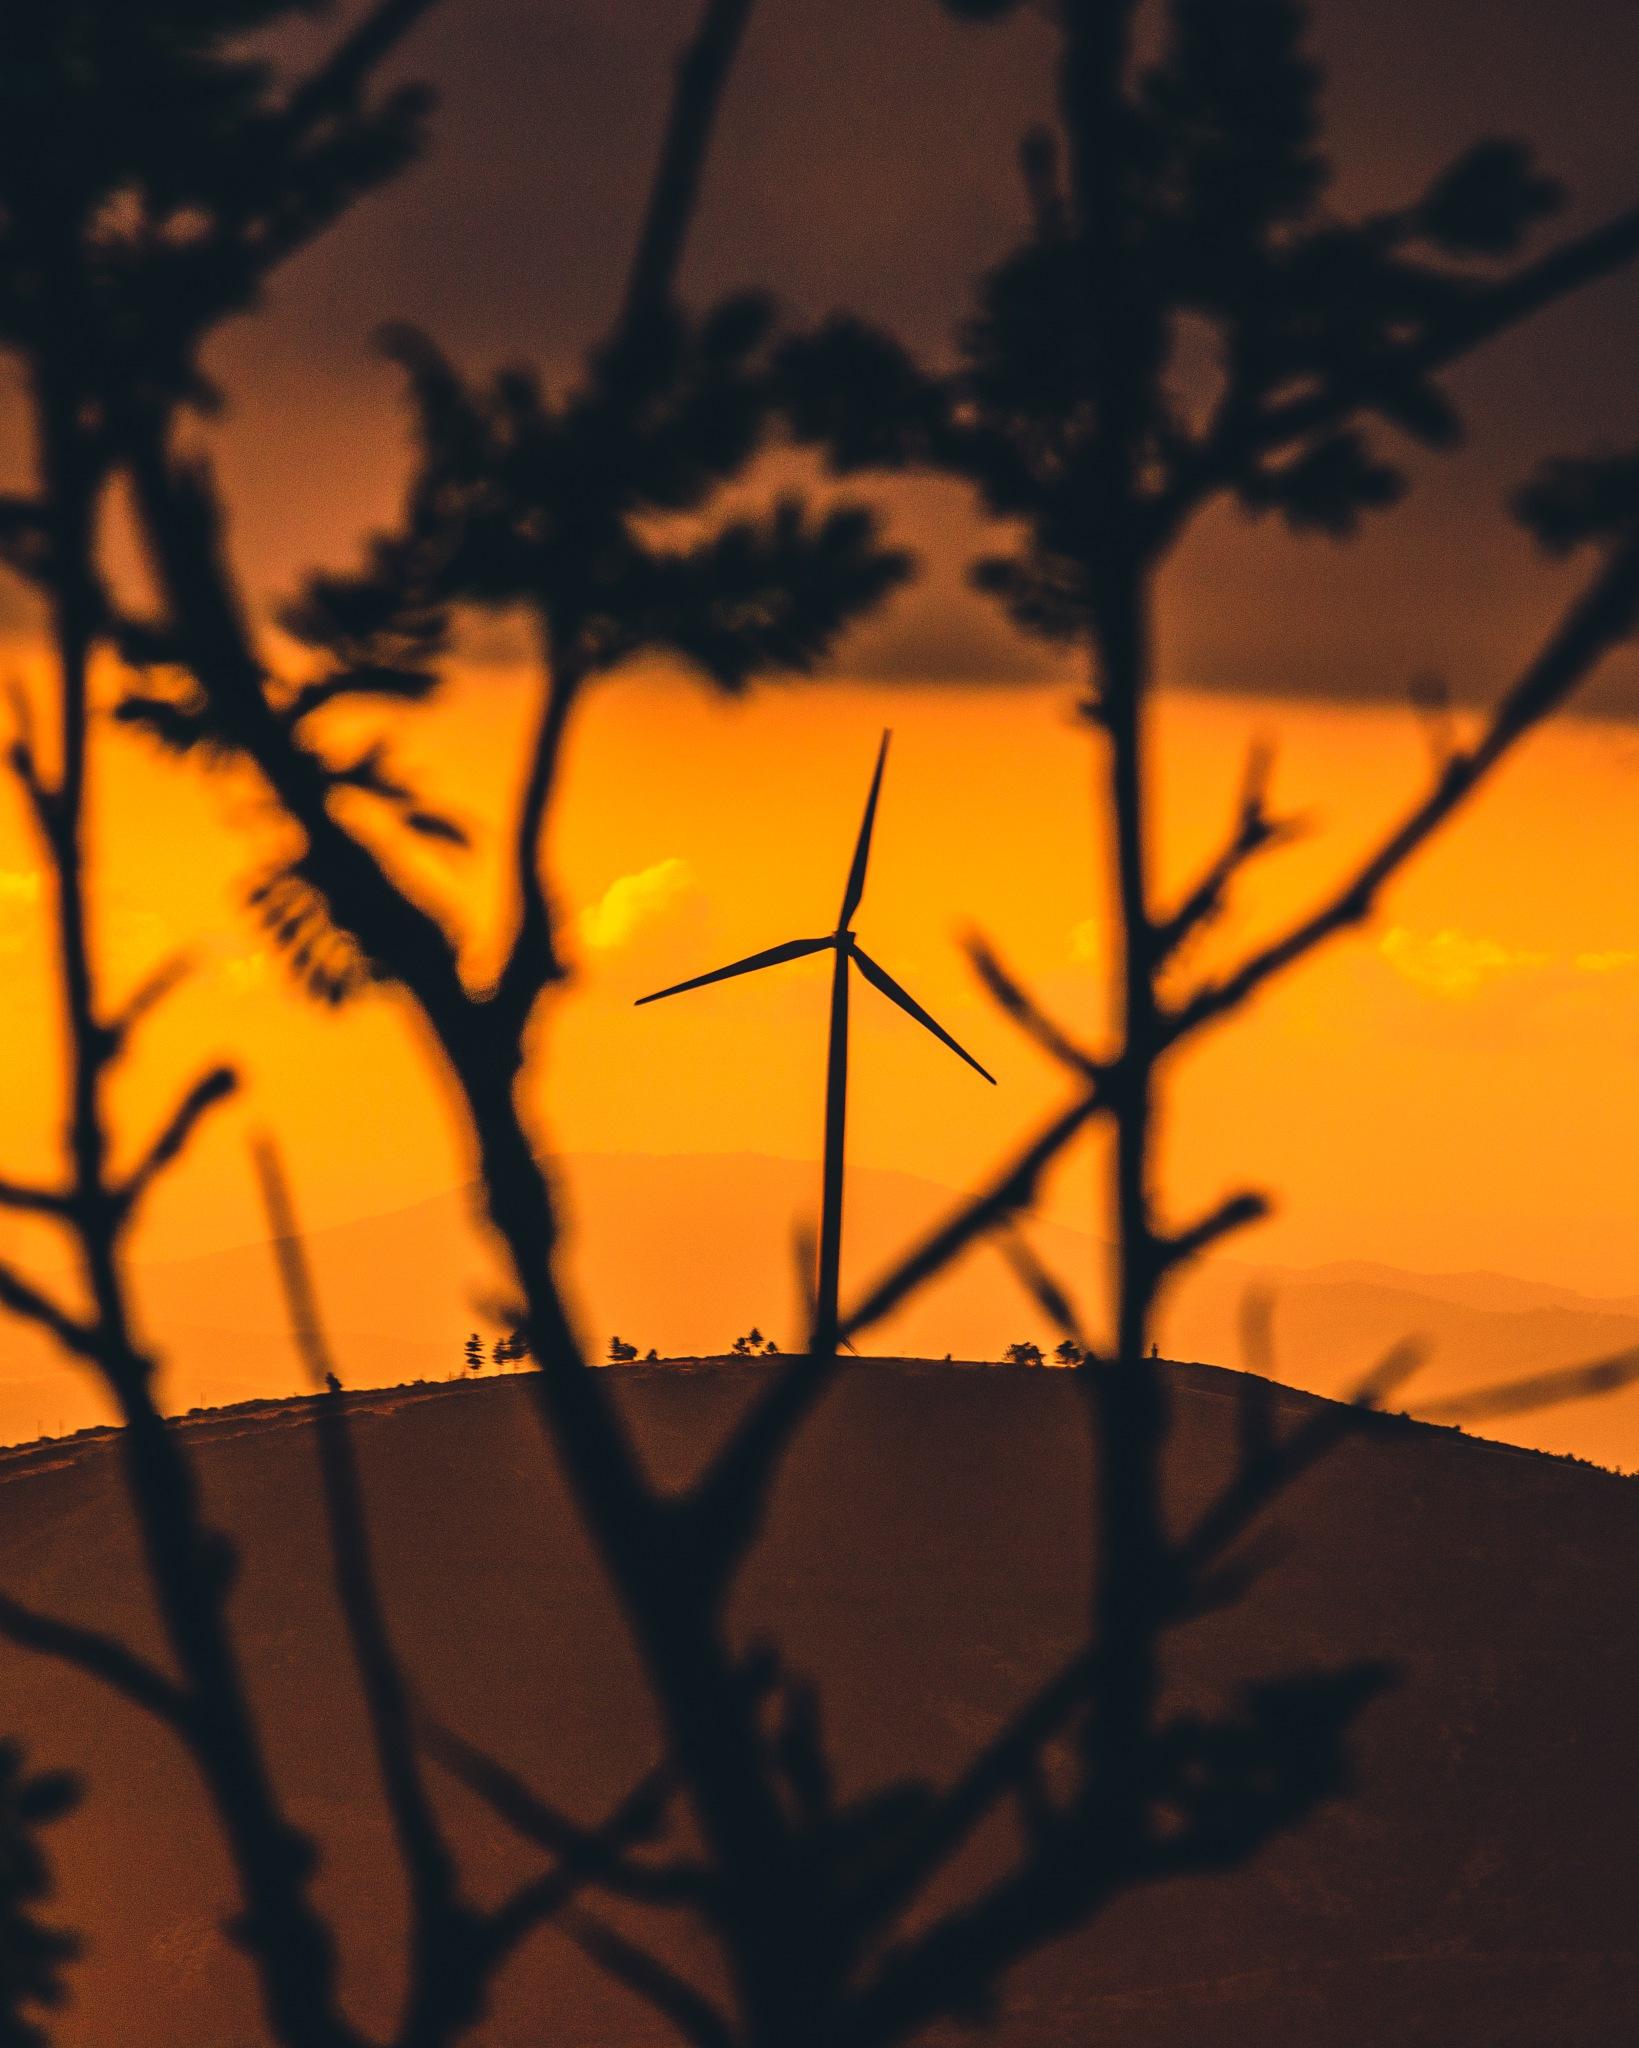 Green Energy @ Trevim by Tiago Santos